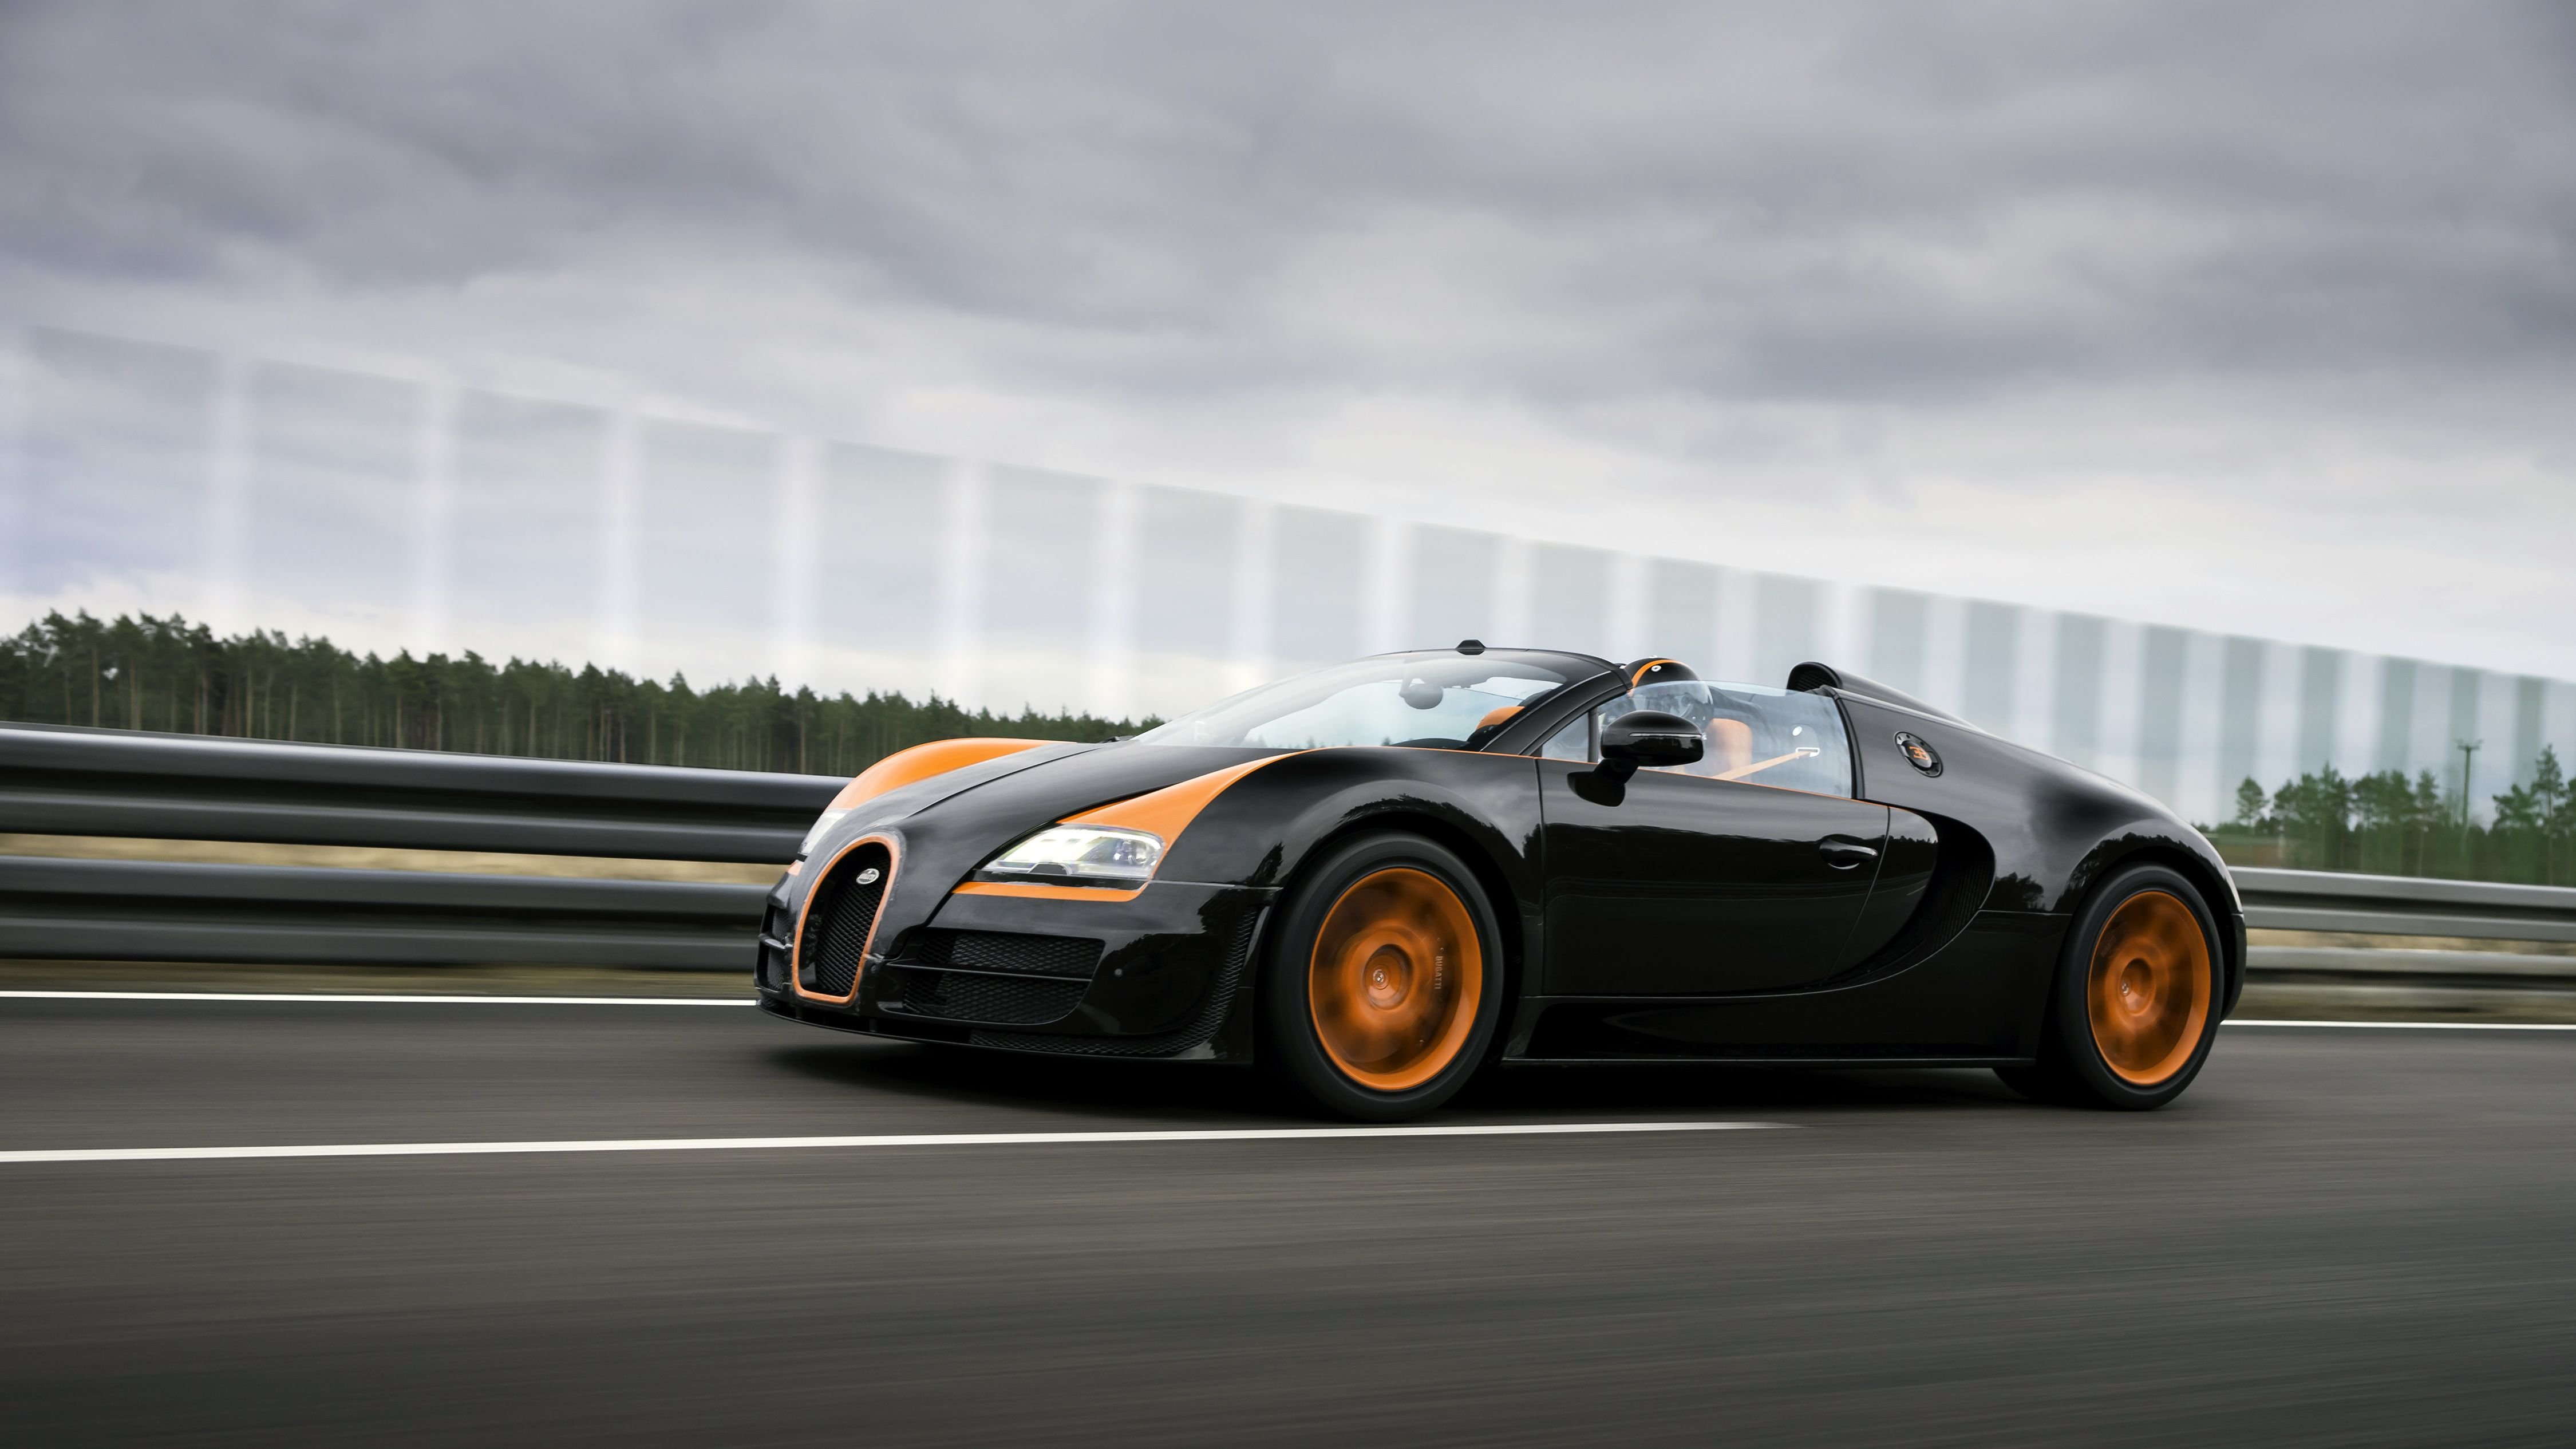 Charming Bugatti 16.4 Veyron Grand Sport Vitesse World Record Car 2013